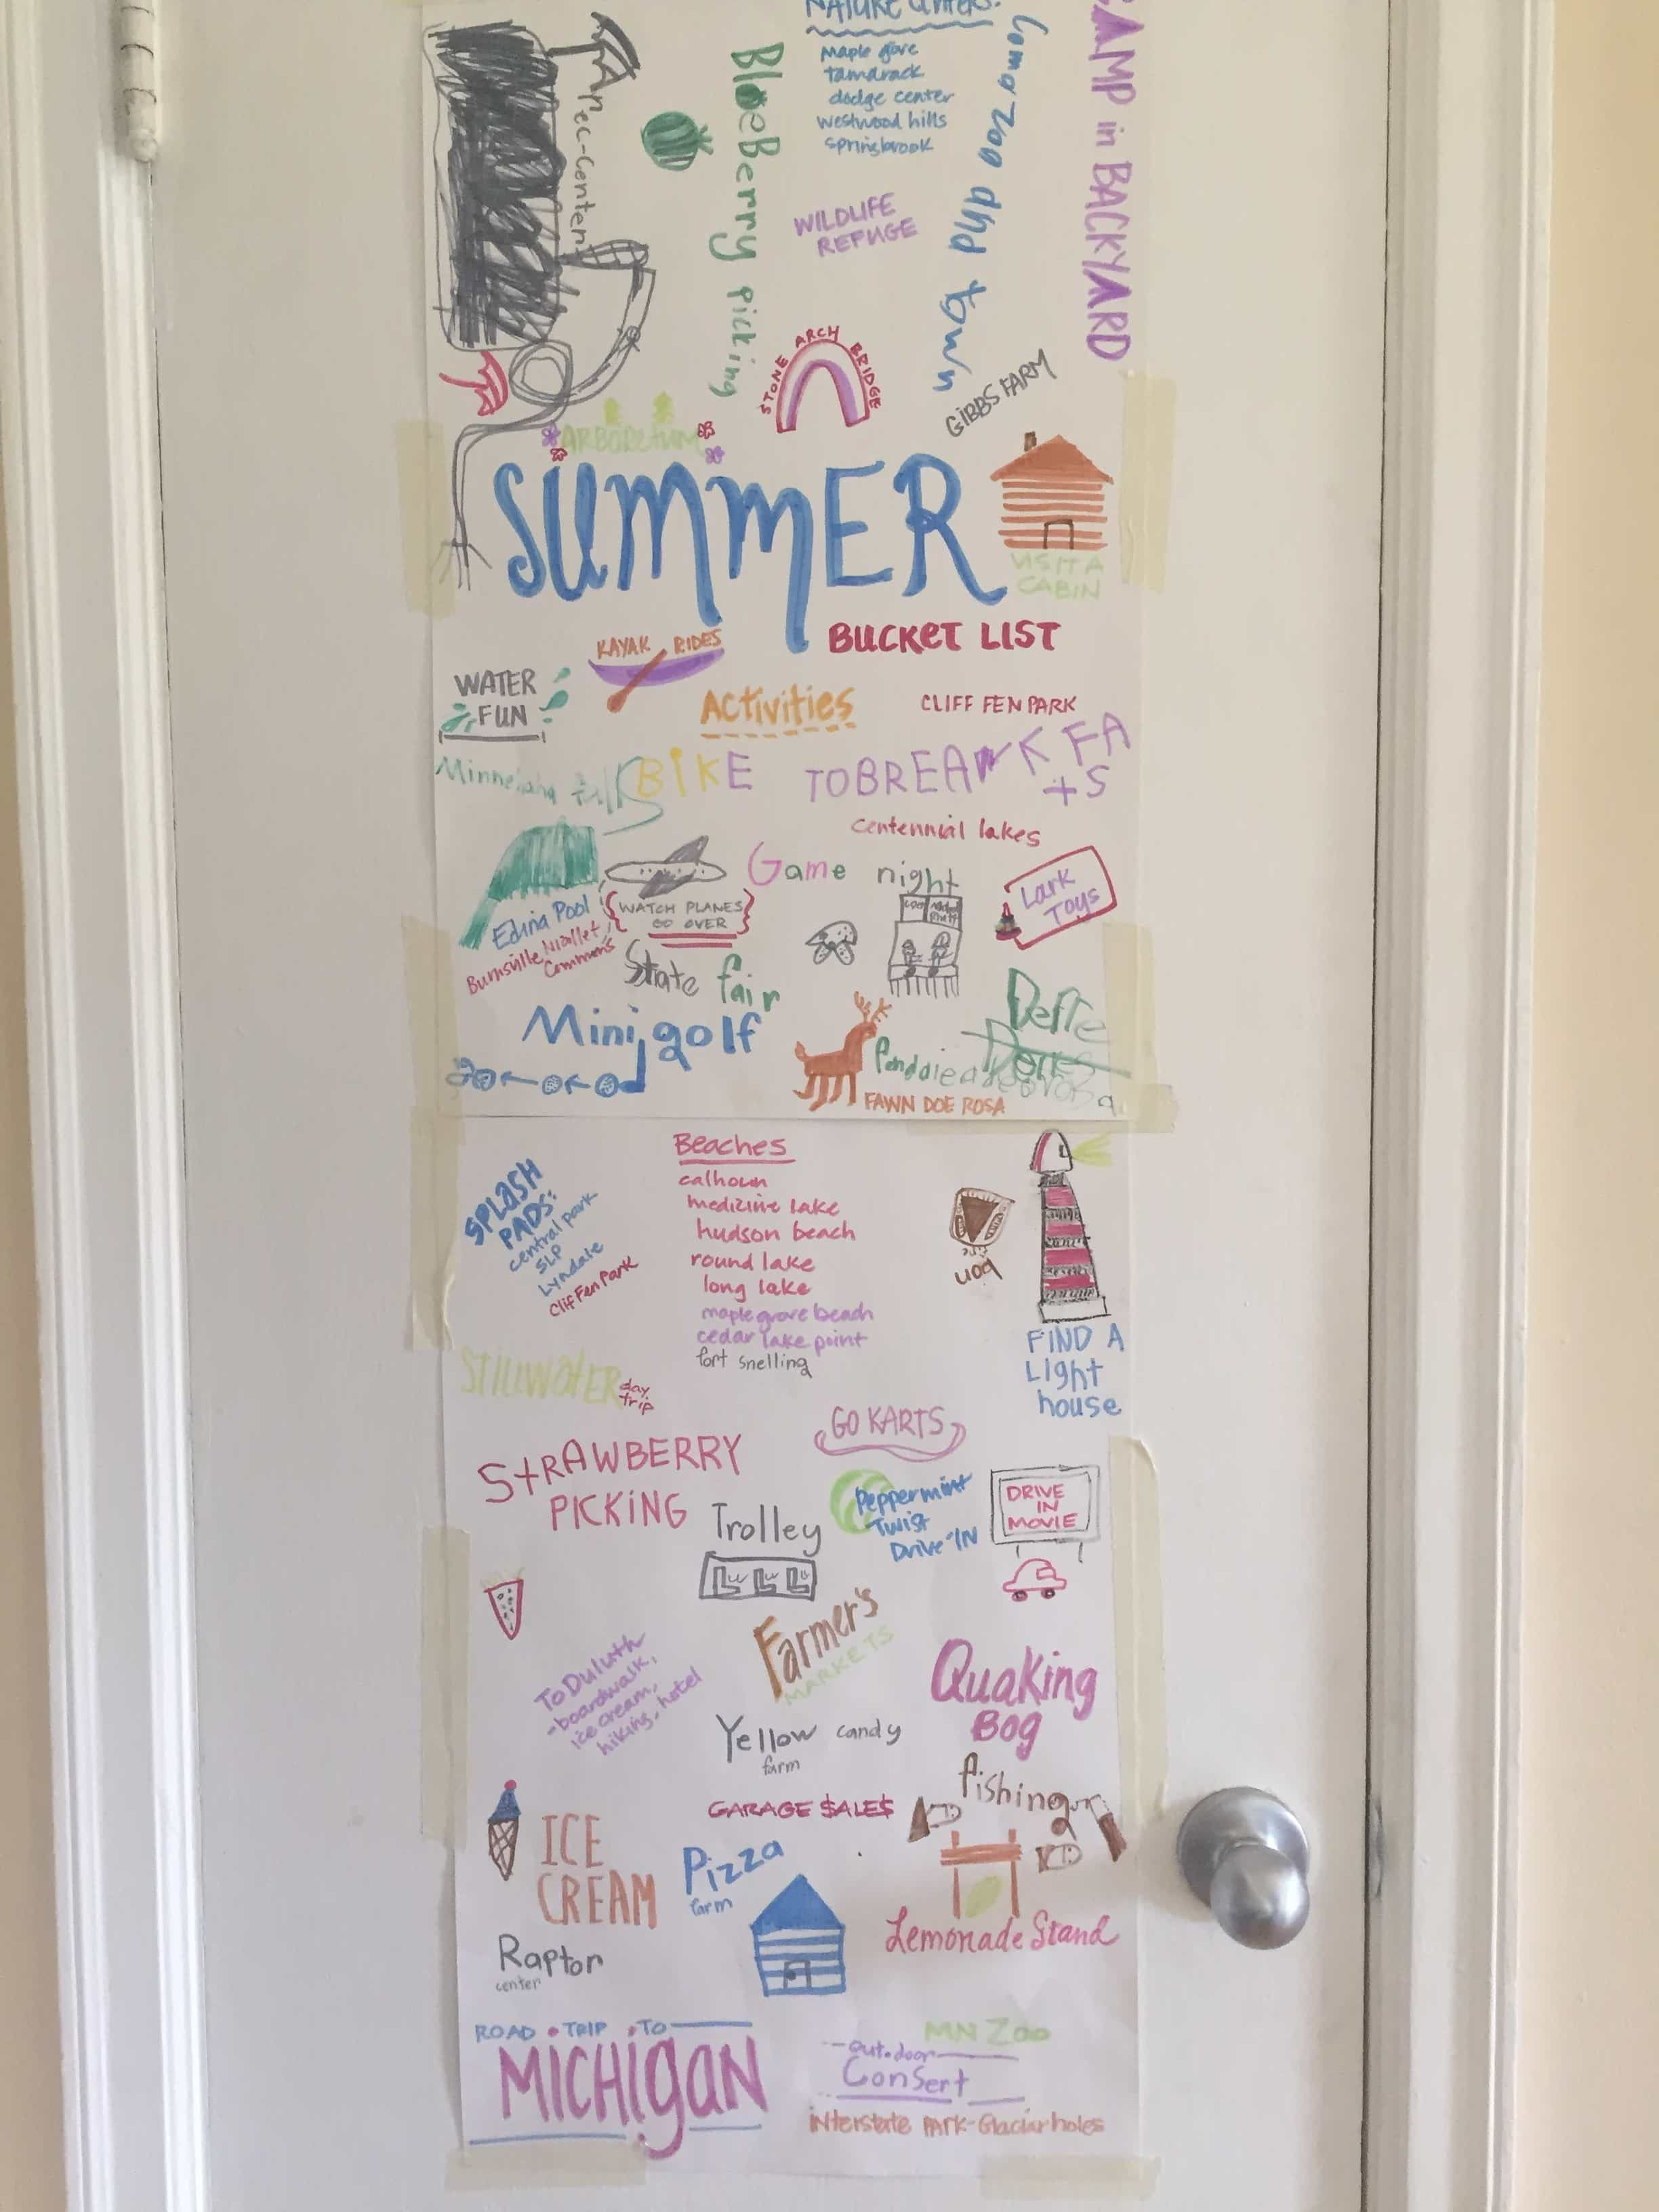 25 Summer Bucket List Items For Minnesota Kids